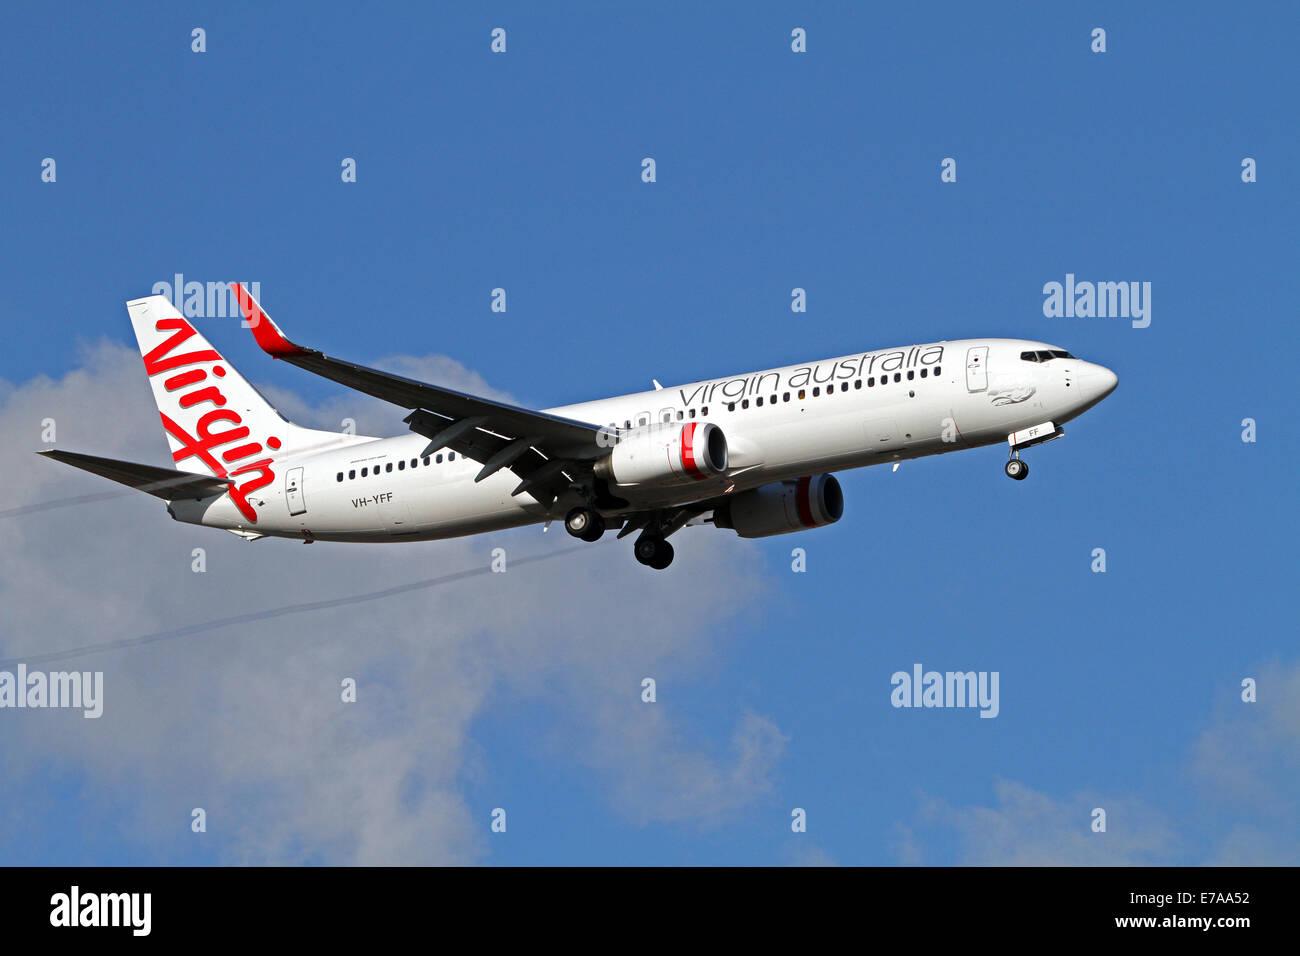 Virgin Australia aircraft preparing to land at Adelaide Airport Australia - Stock Image